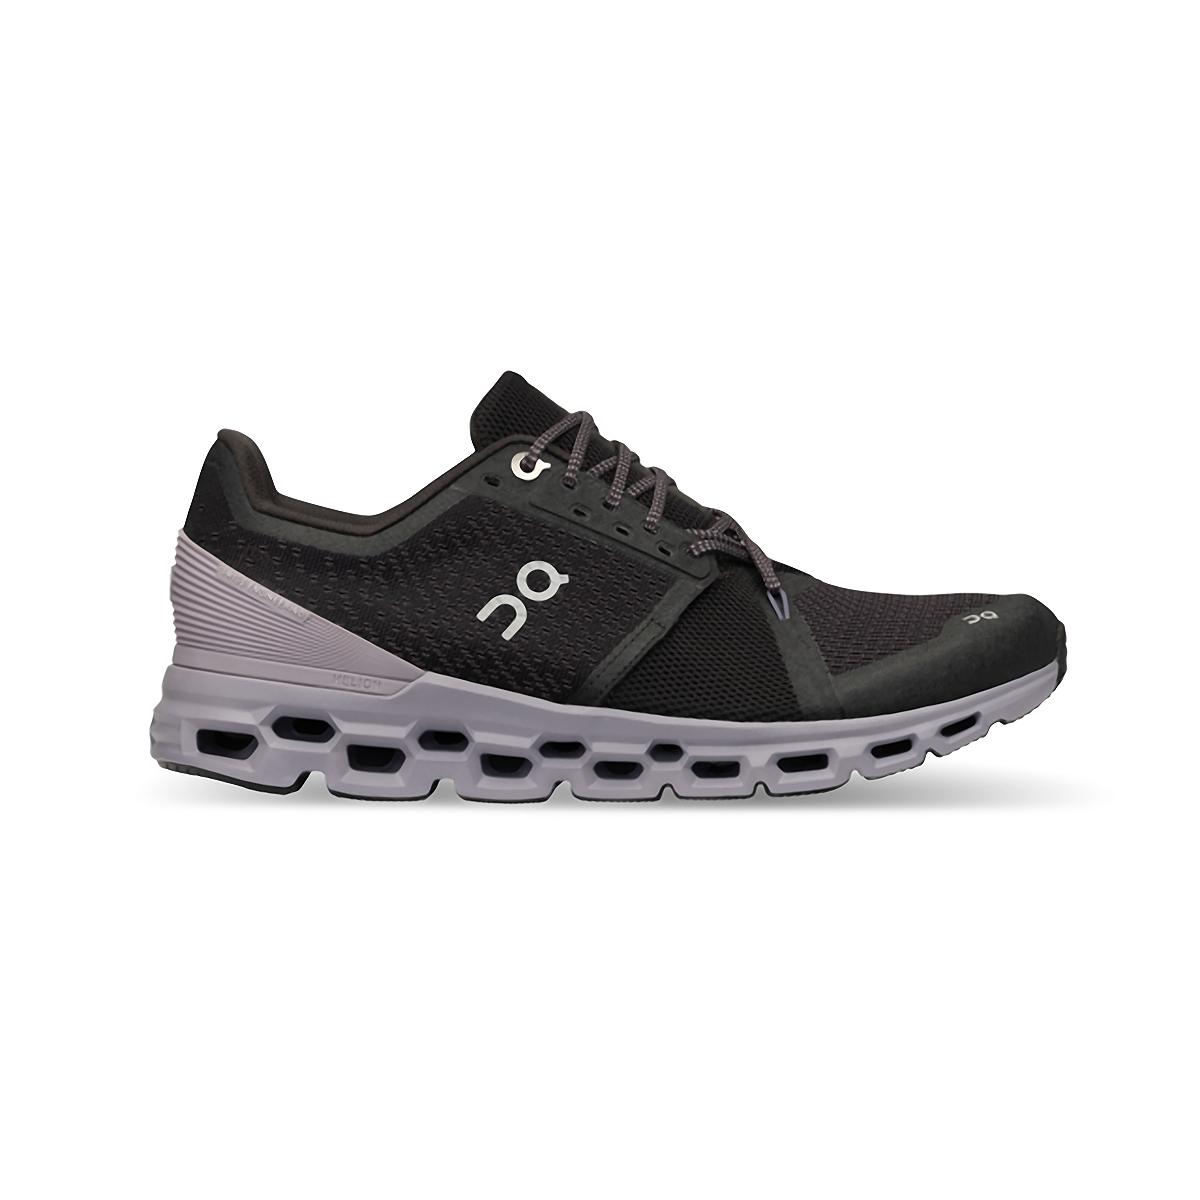 Women's On Cloudstratus Running Shoe - Color: Black/Lilac - Size: 5 - Width: Regular, Black/Lilac, large, image 1